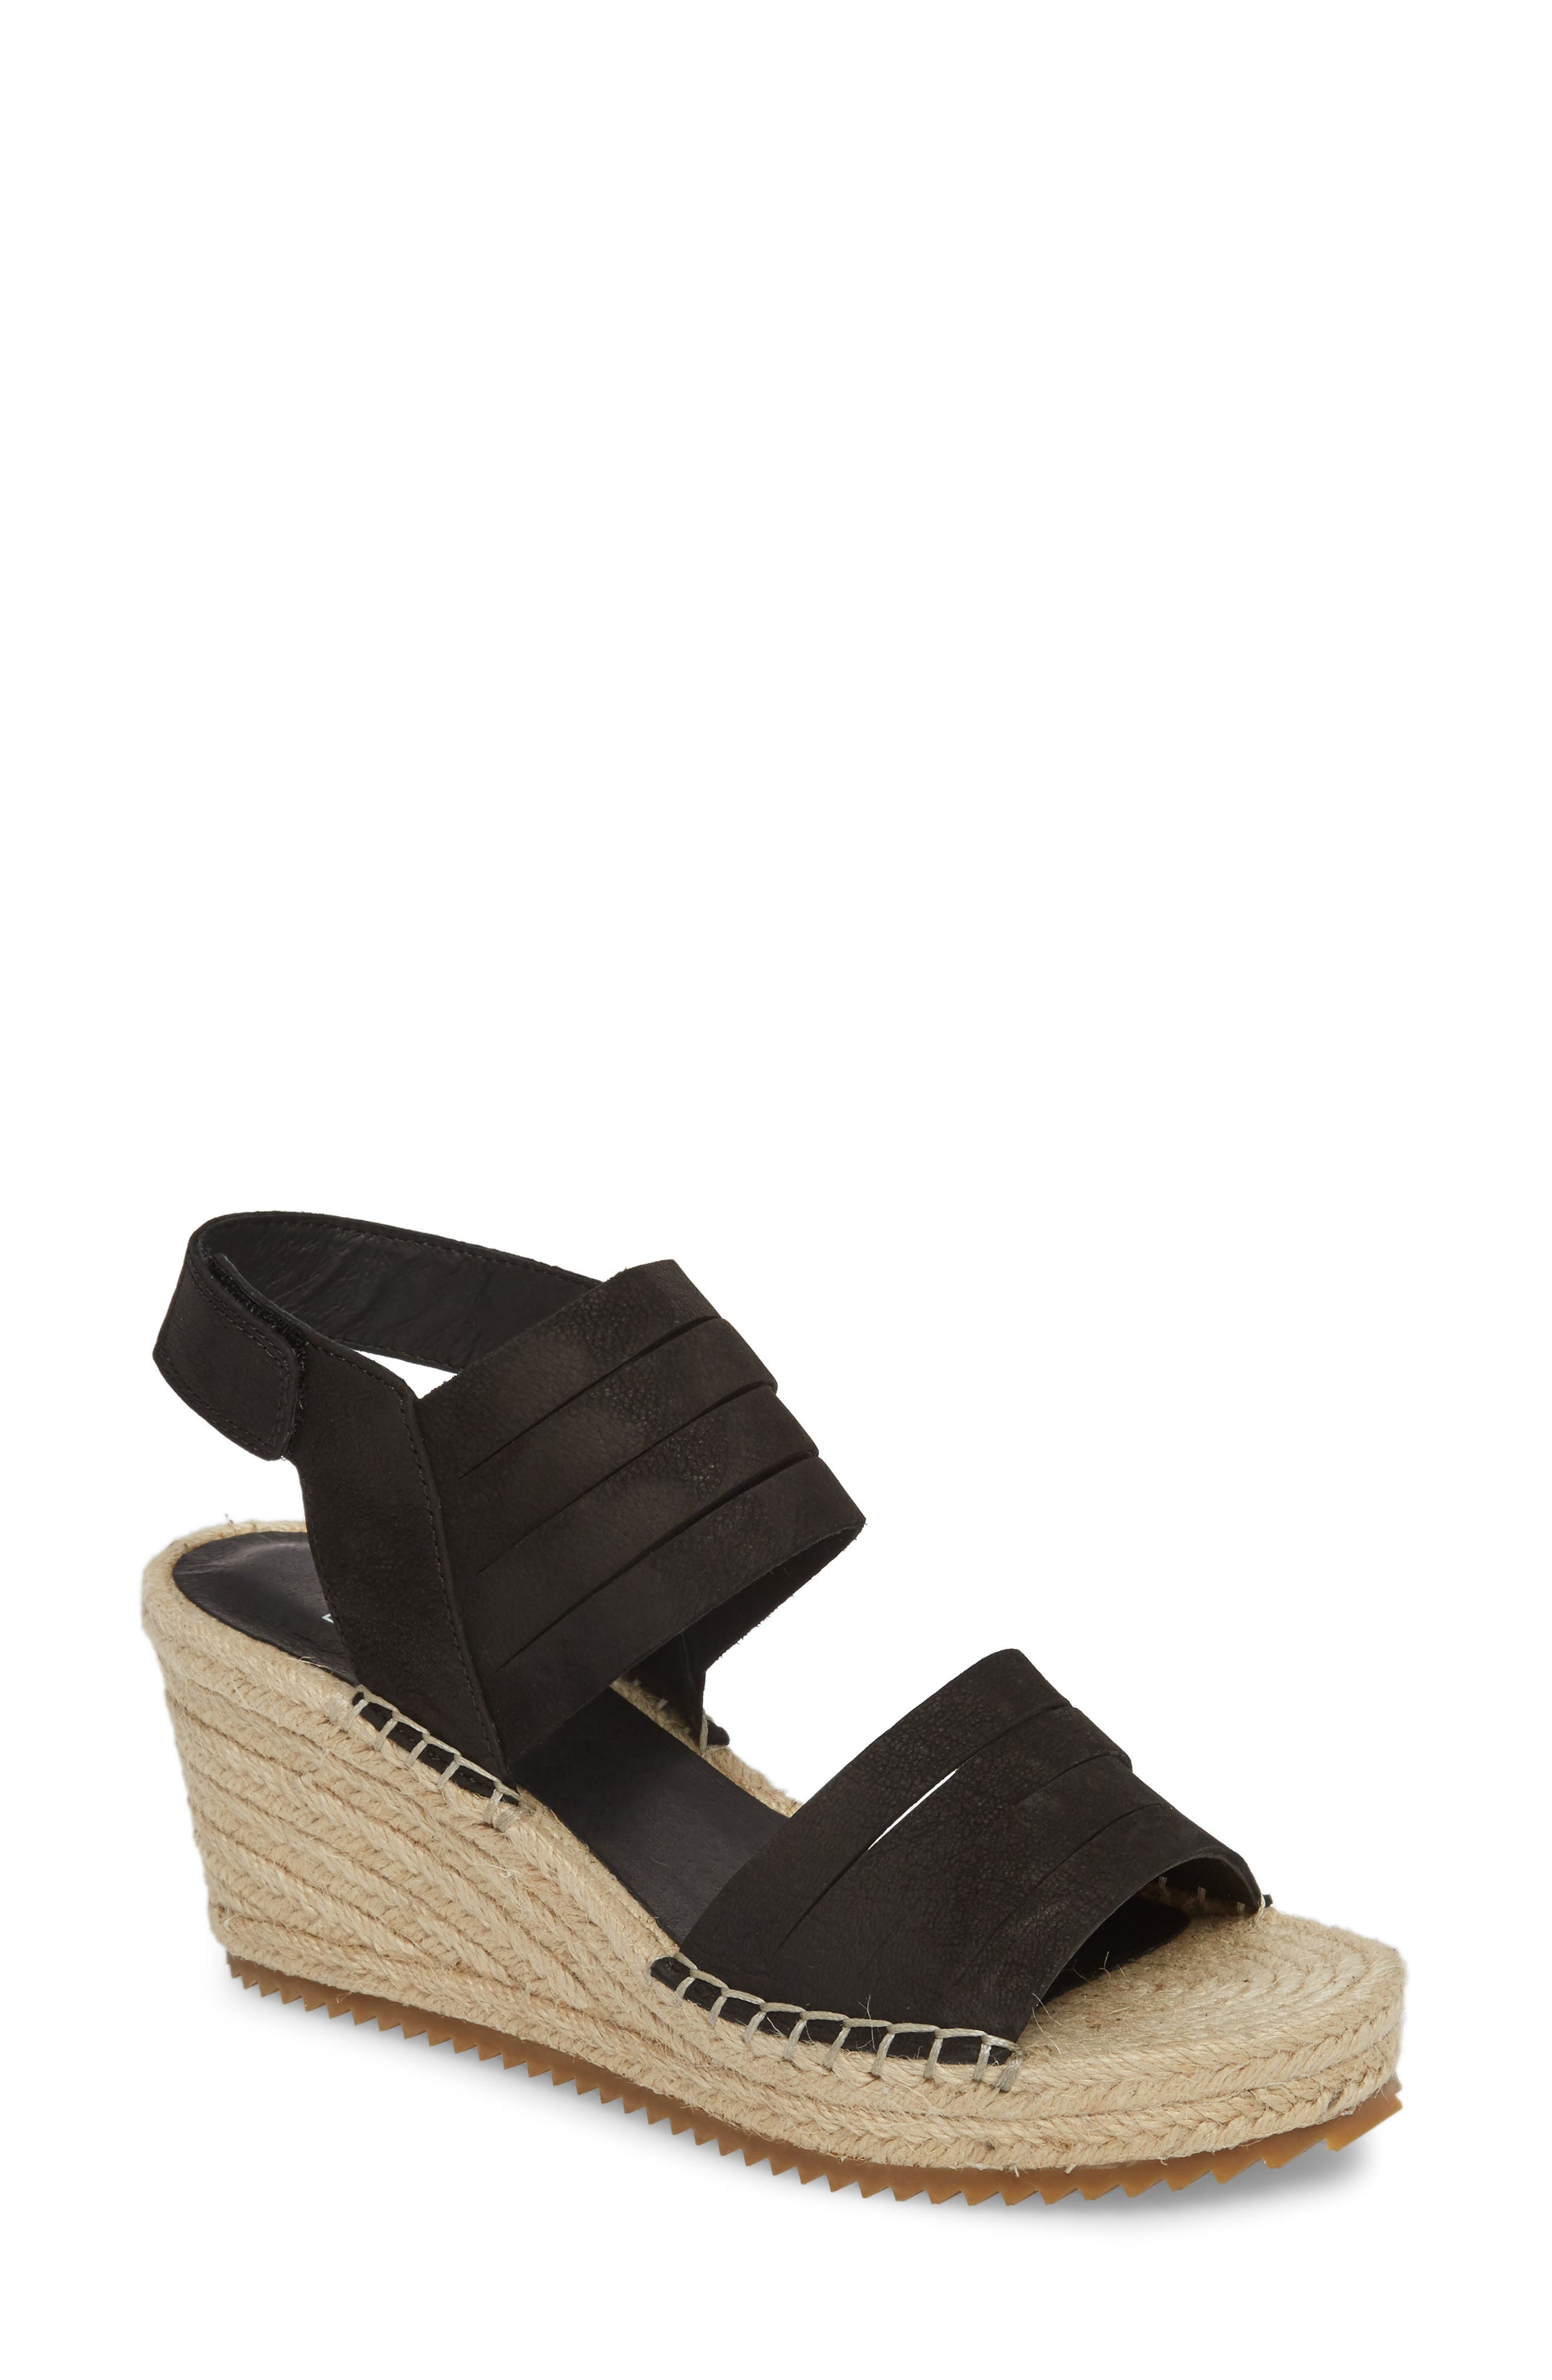 Largo Espadrille Wedge Sandal,                         Main,                         color, 001